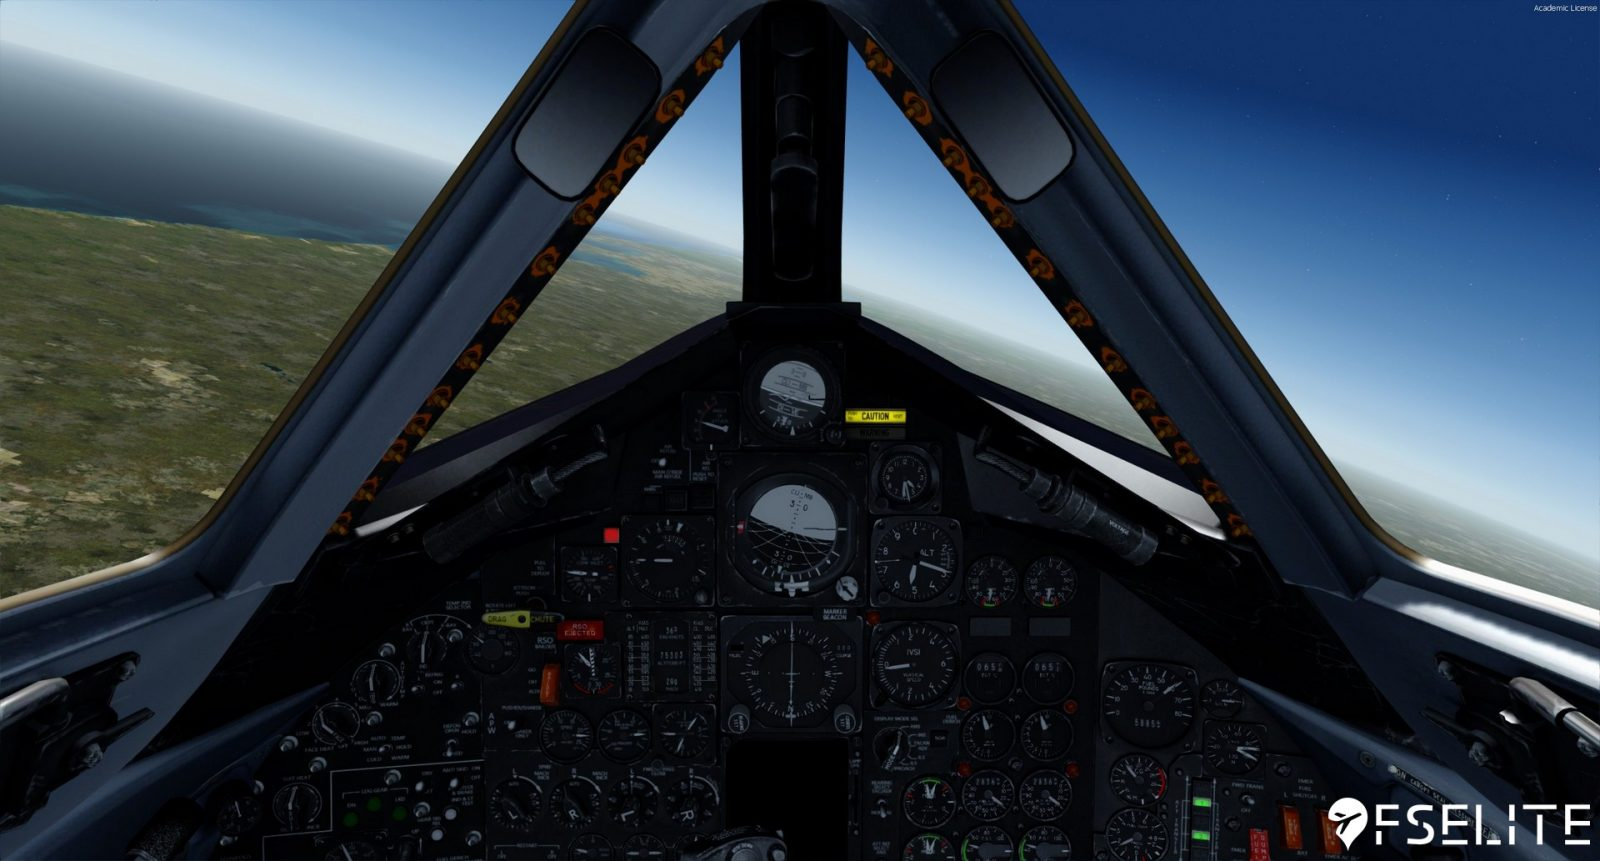 prepar3d / fsx] Milviz SR-71 Blackbird: The FSElite First